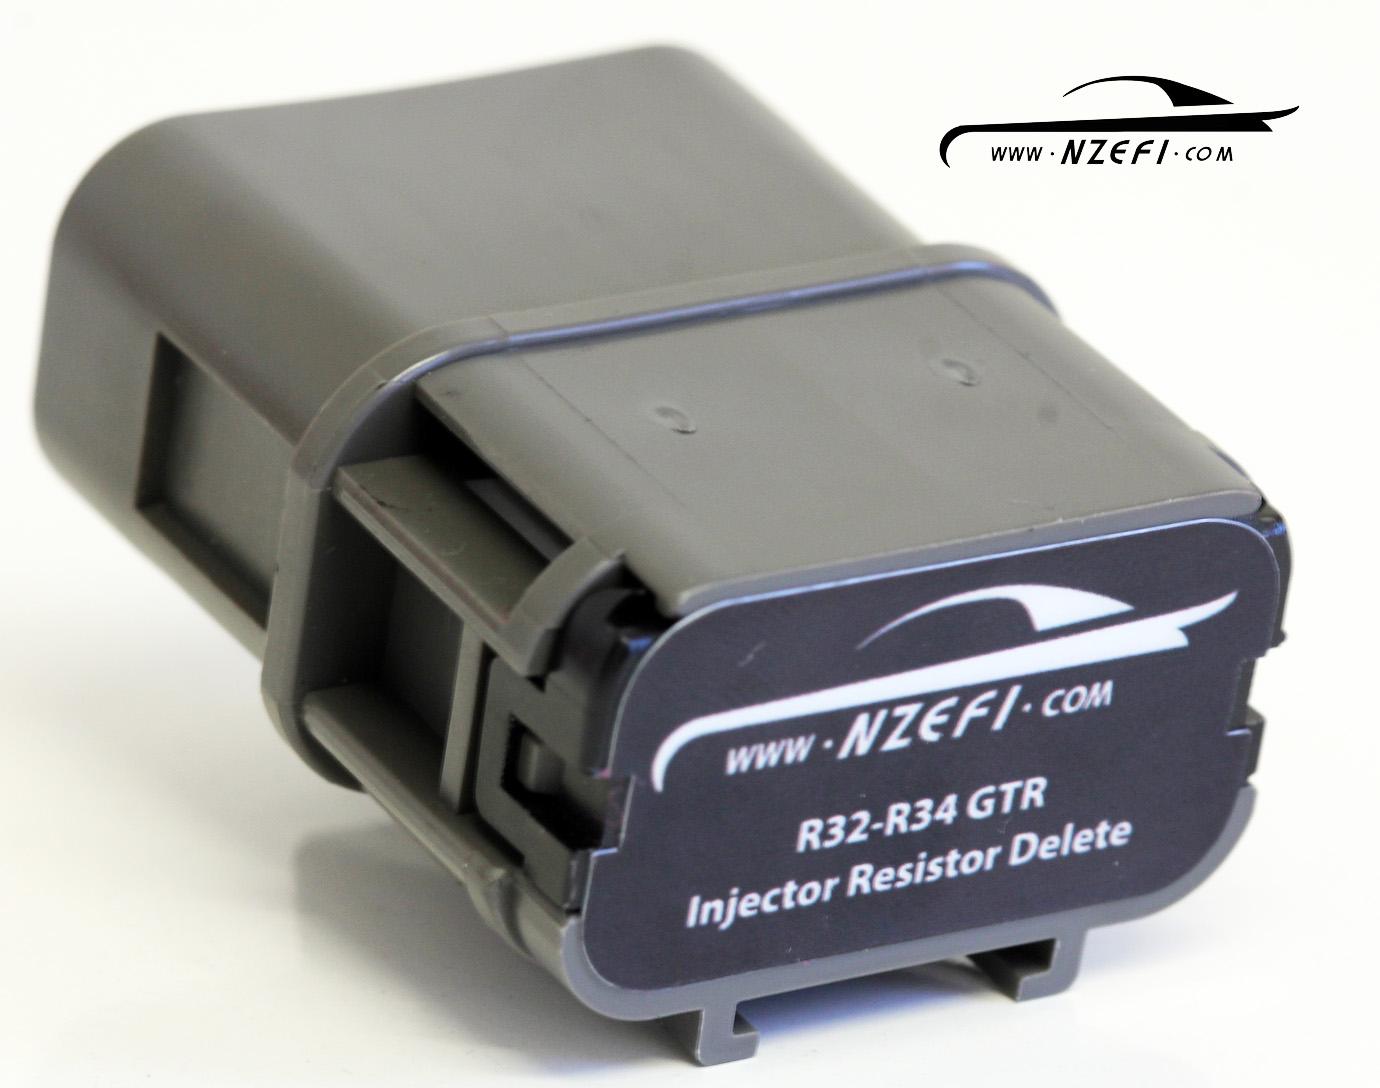 NZEFI R32-R34 Skyline GTR Injector Resistor Delete - NZEFI ...